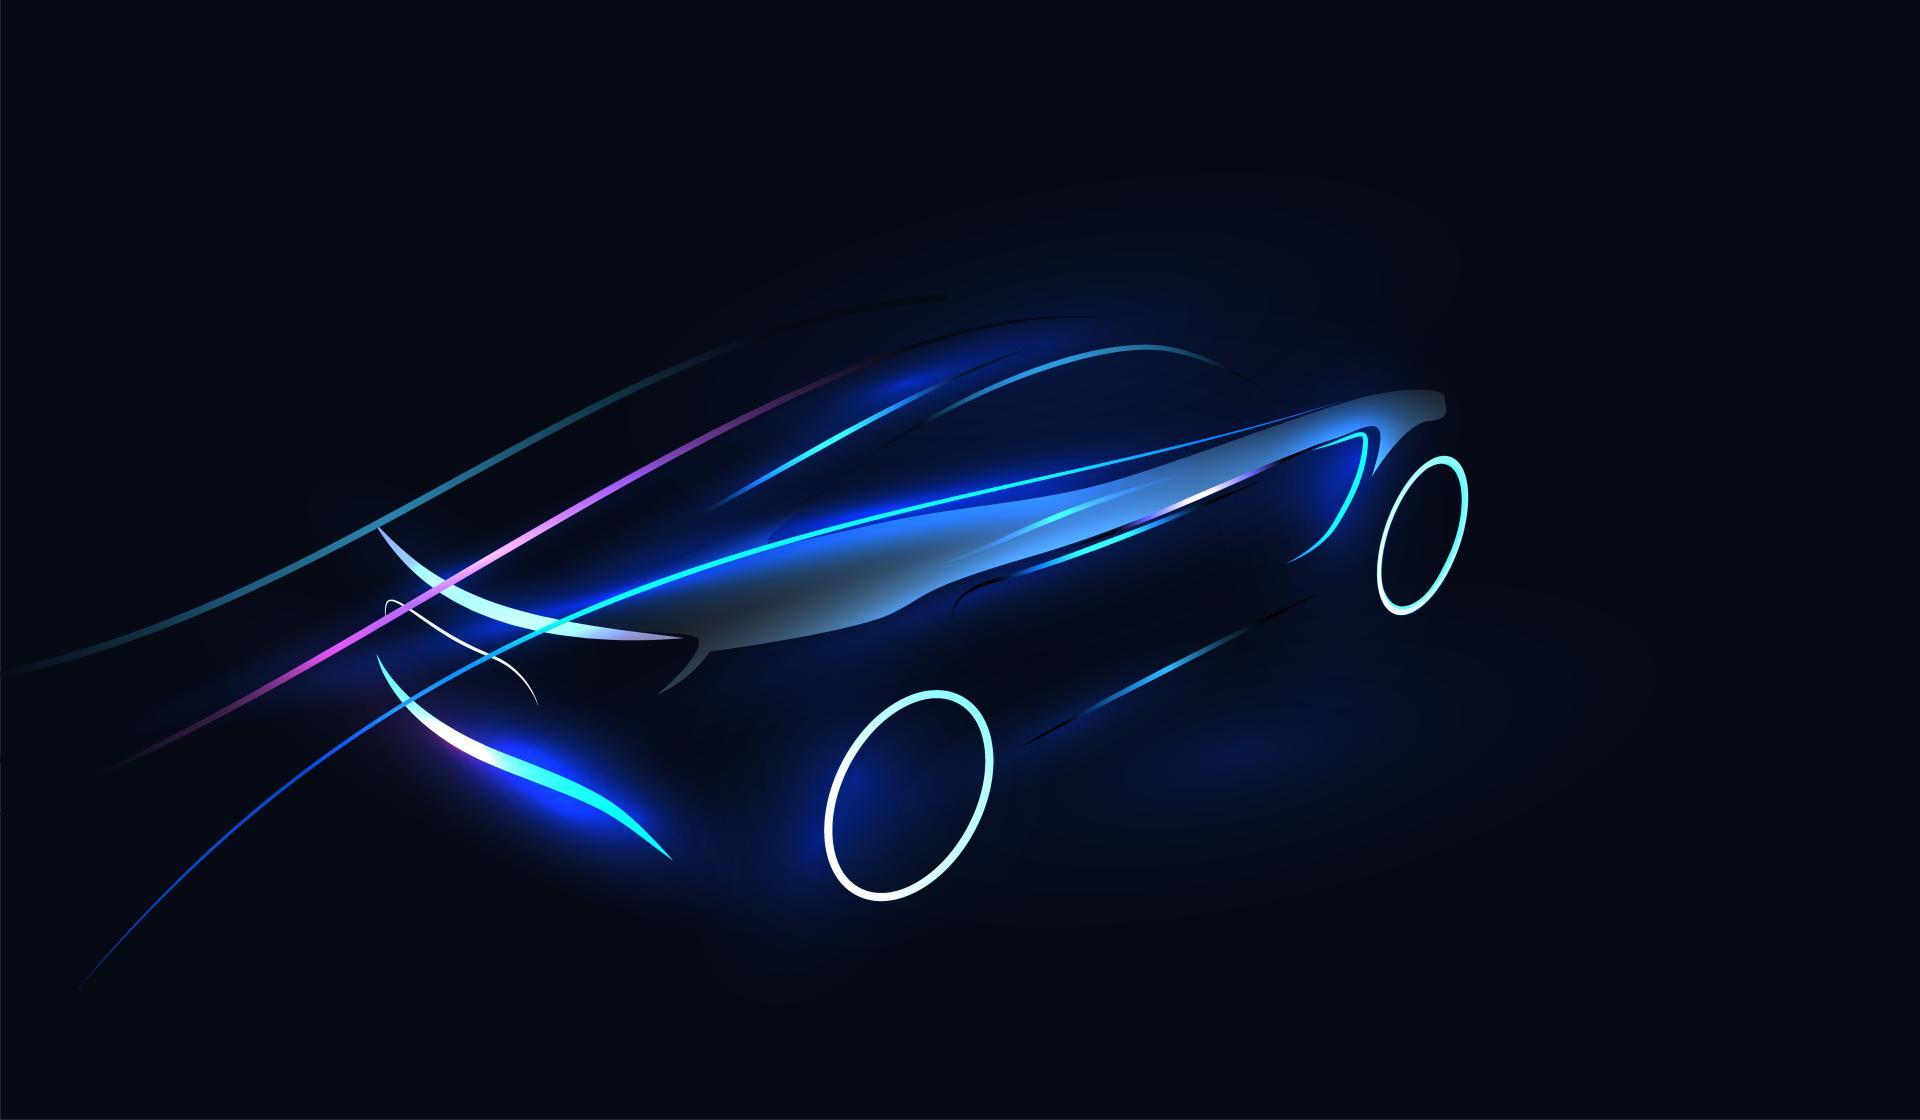 Evergrande übernimmt Saab-Nachfolger NEVS komplett